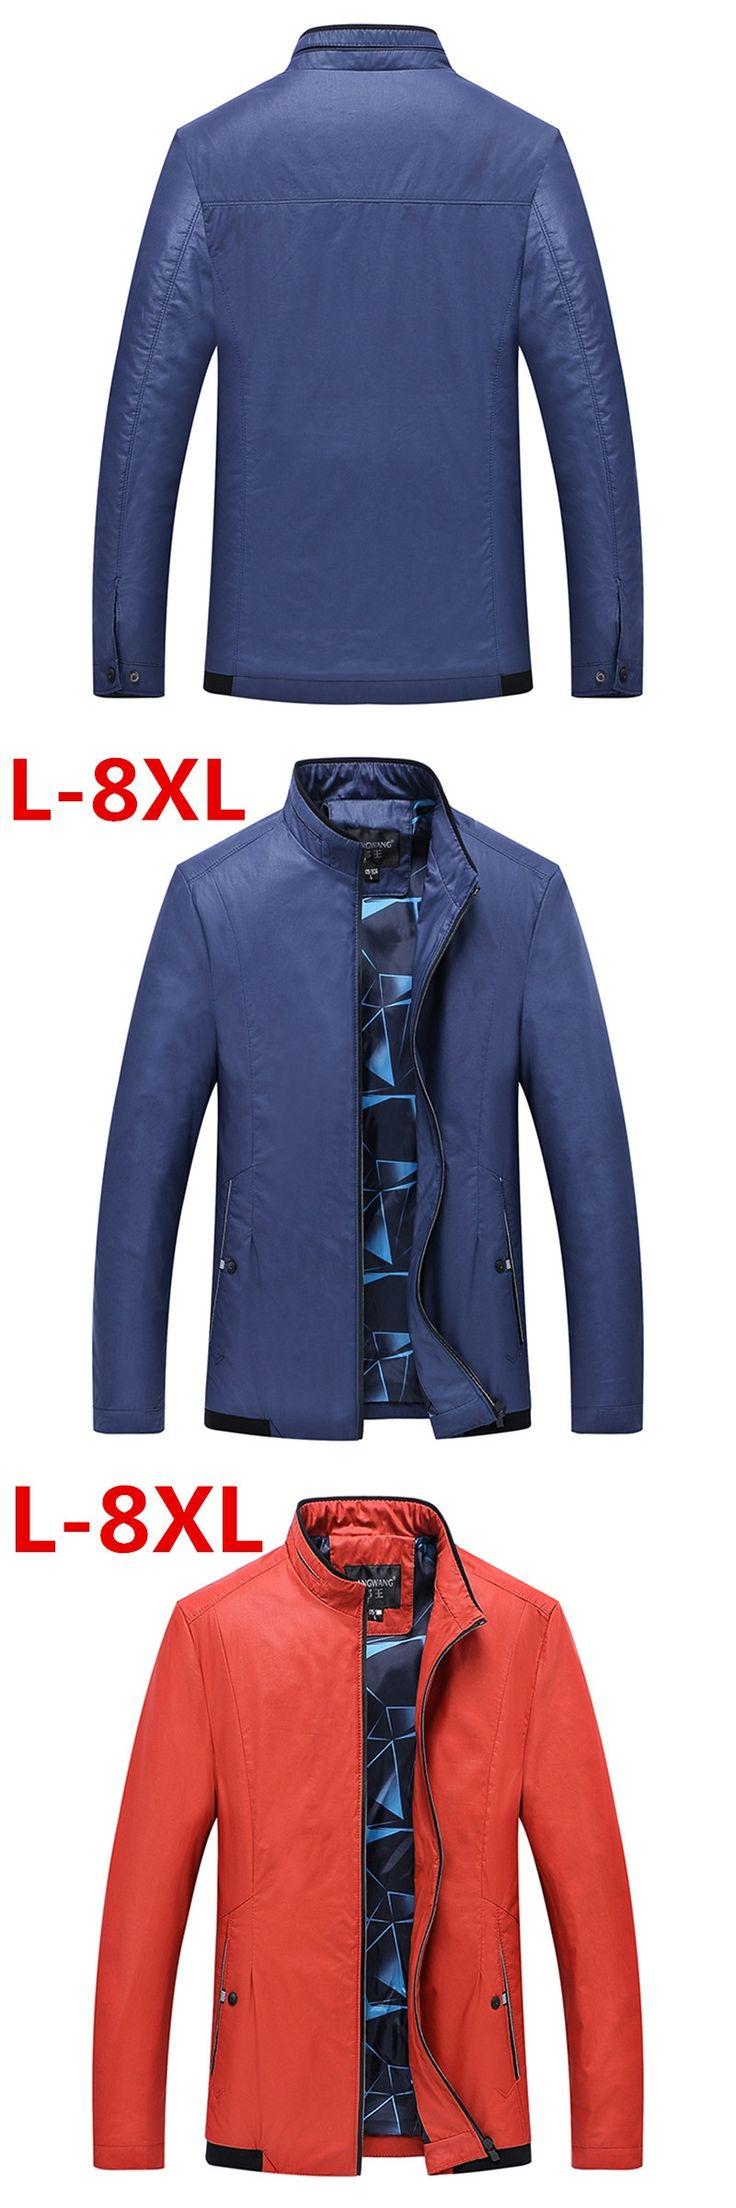 new 8XL 7XL 6XL 5XL Men's Jacket Male Overcoat Casual Slim Fit Mandarin Collar Solid Waterproof Jackets M-XXXL Men Jackets coats